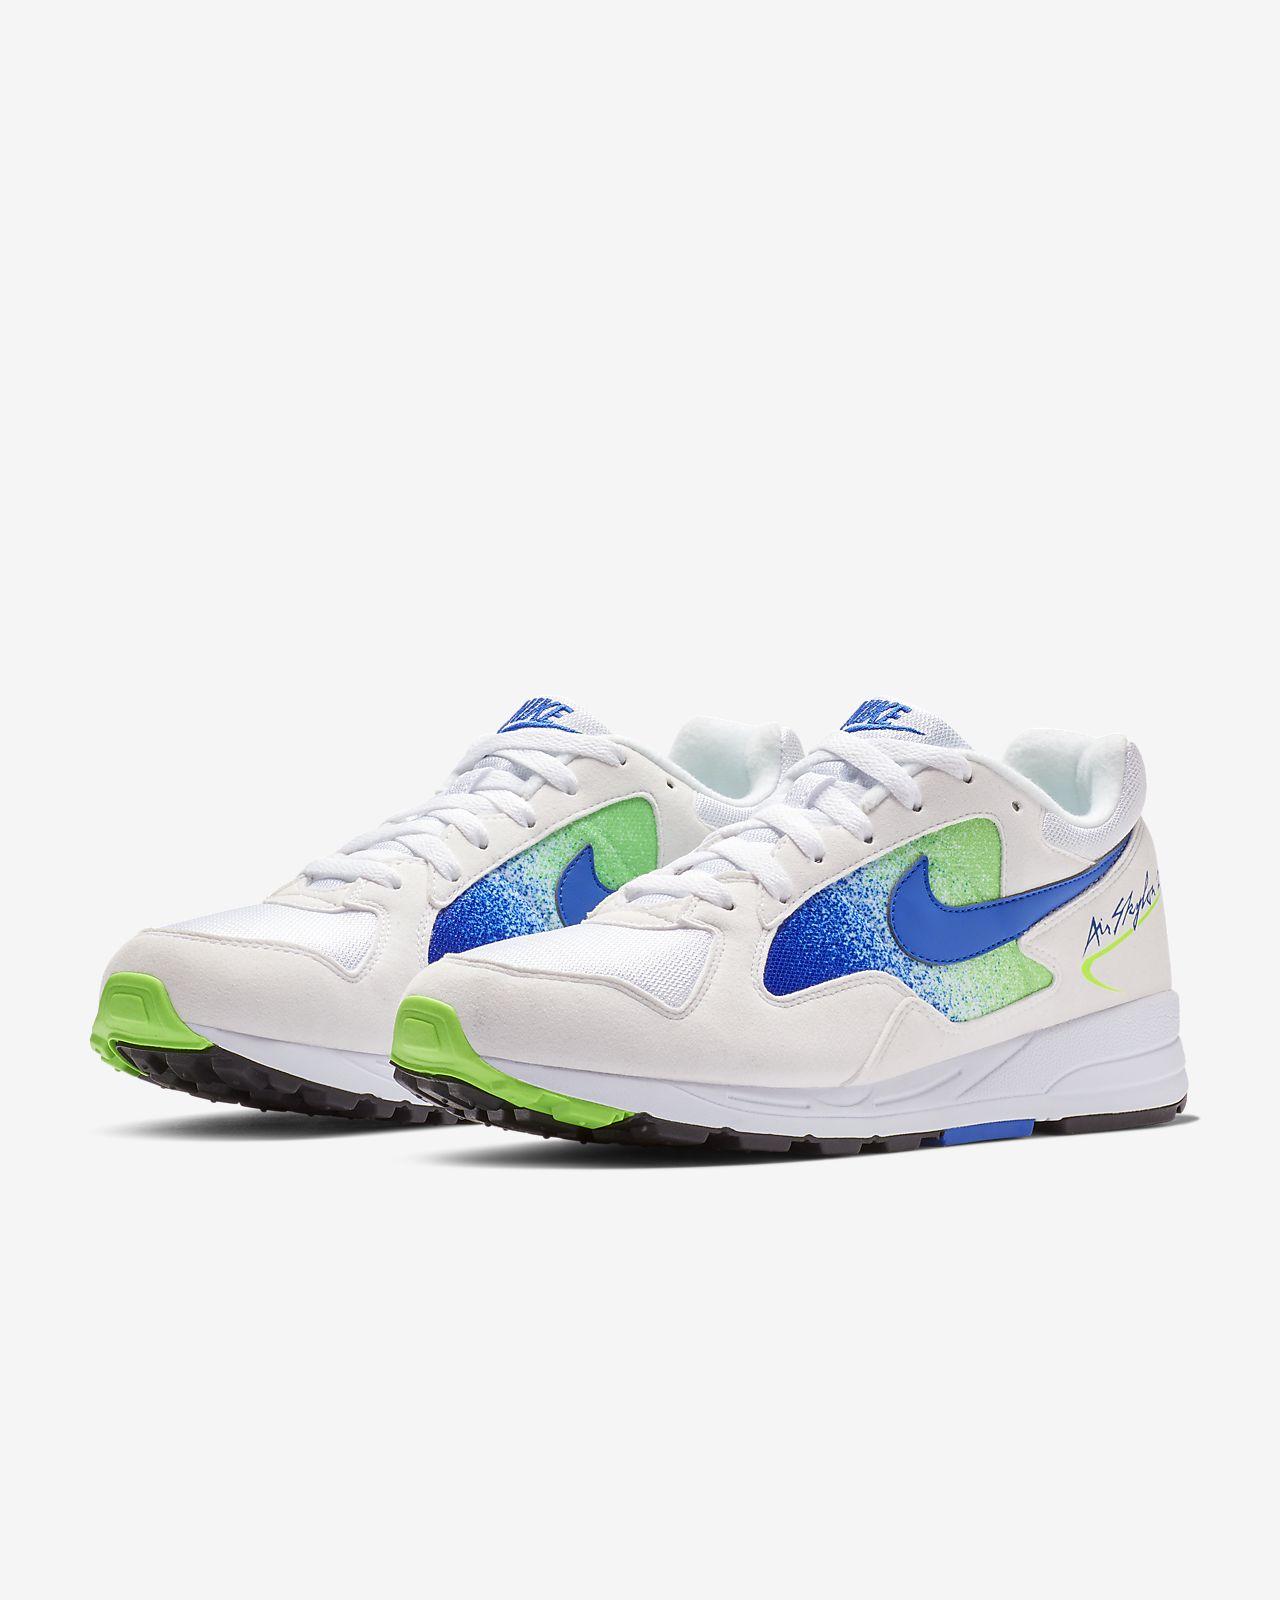 classic fit b166d b7263 Nike Air Skylon II Men's Shoe. Nike.com